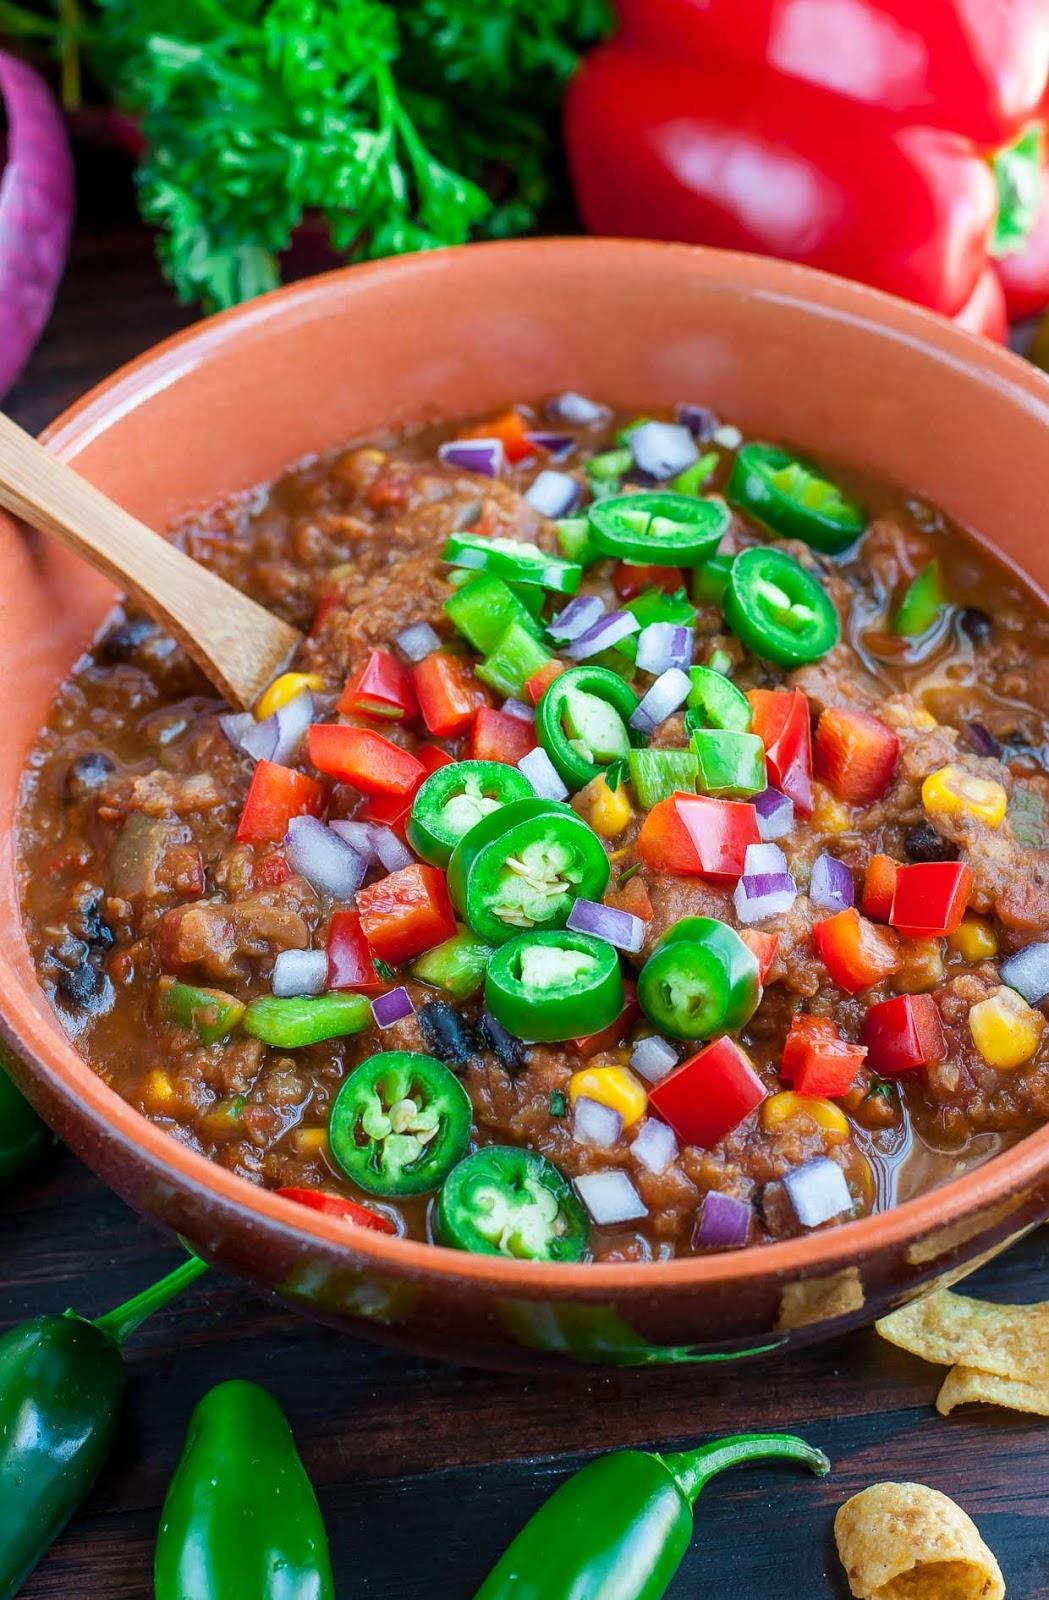 VEGAN LENTIL CHILI #vegan #vegetarian #chili #paleo #food